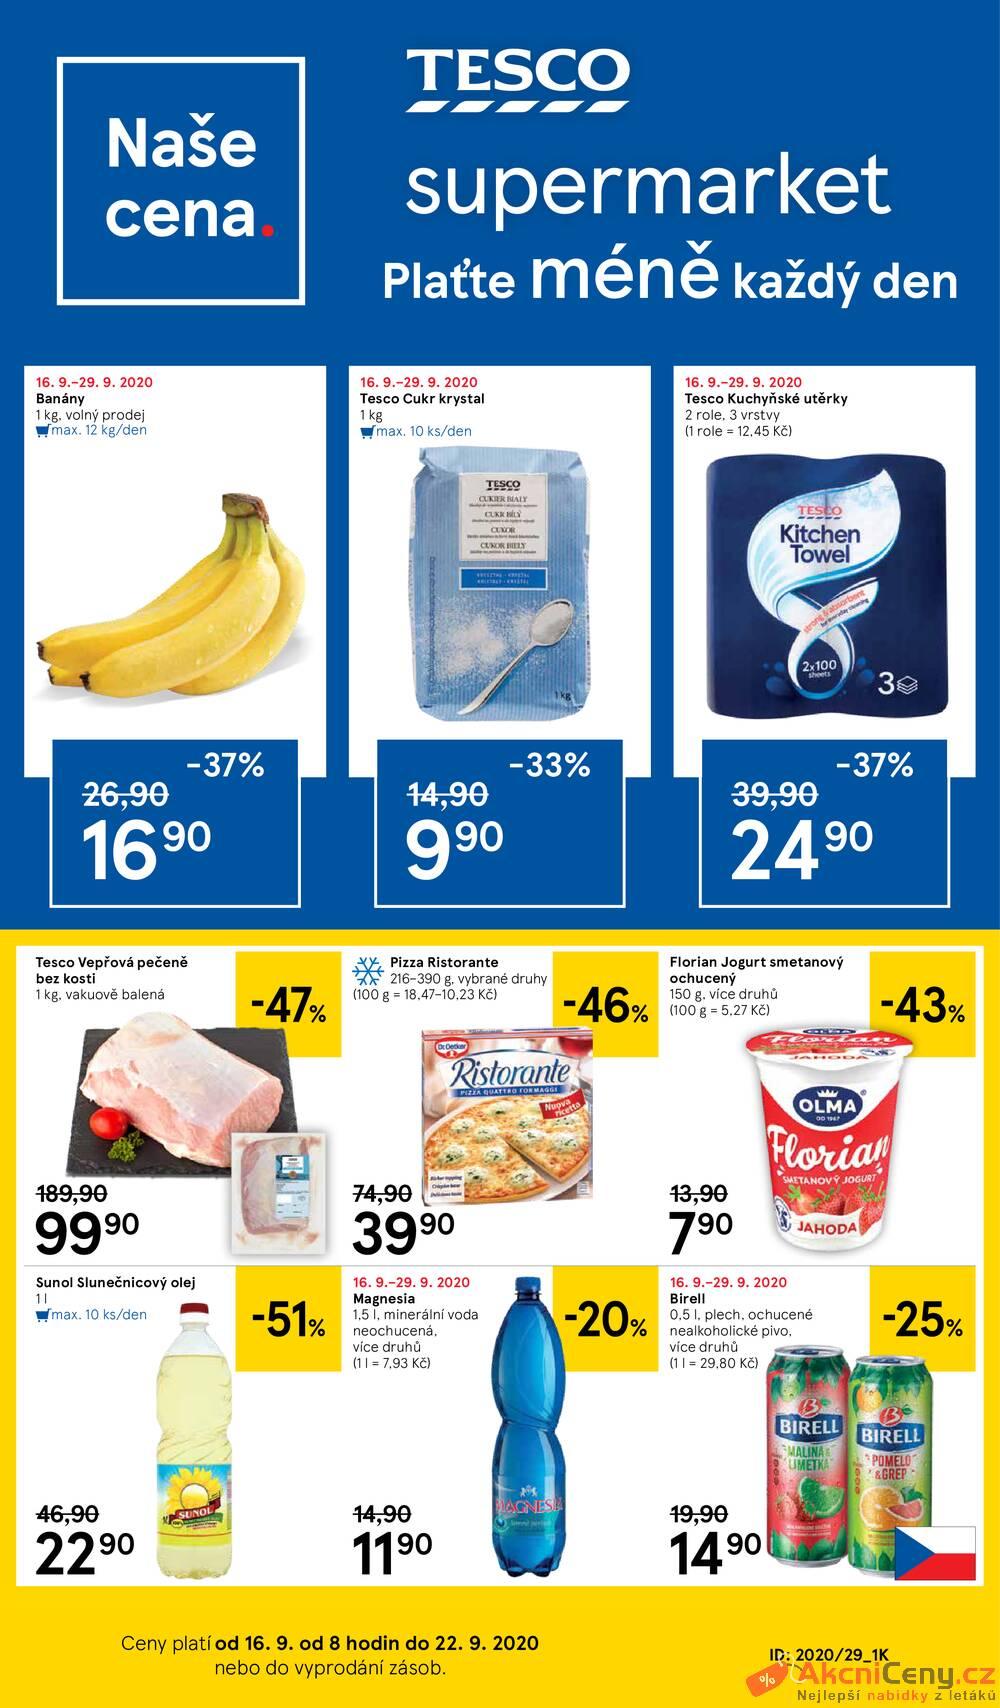 Tesco supermarkety od 16.9. do 22.9.2020